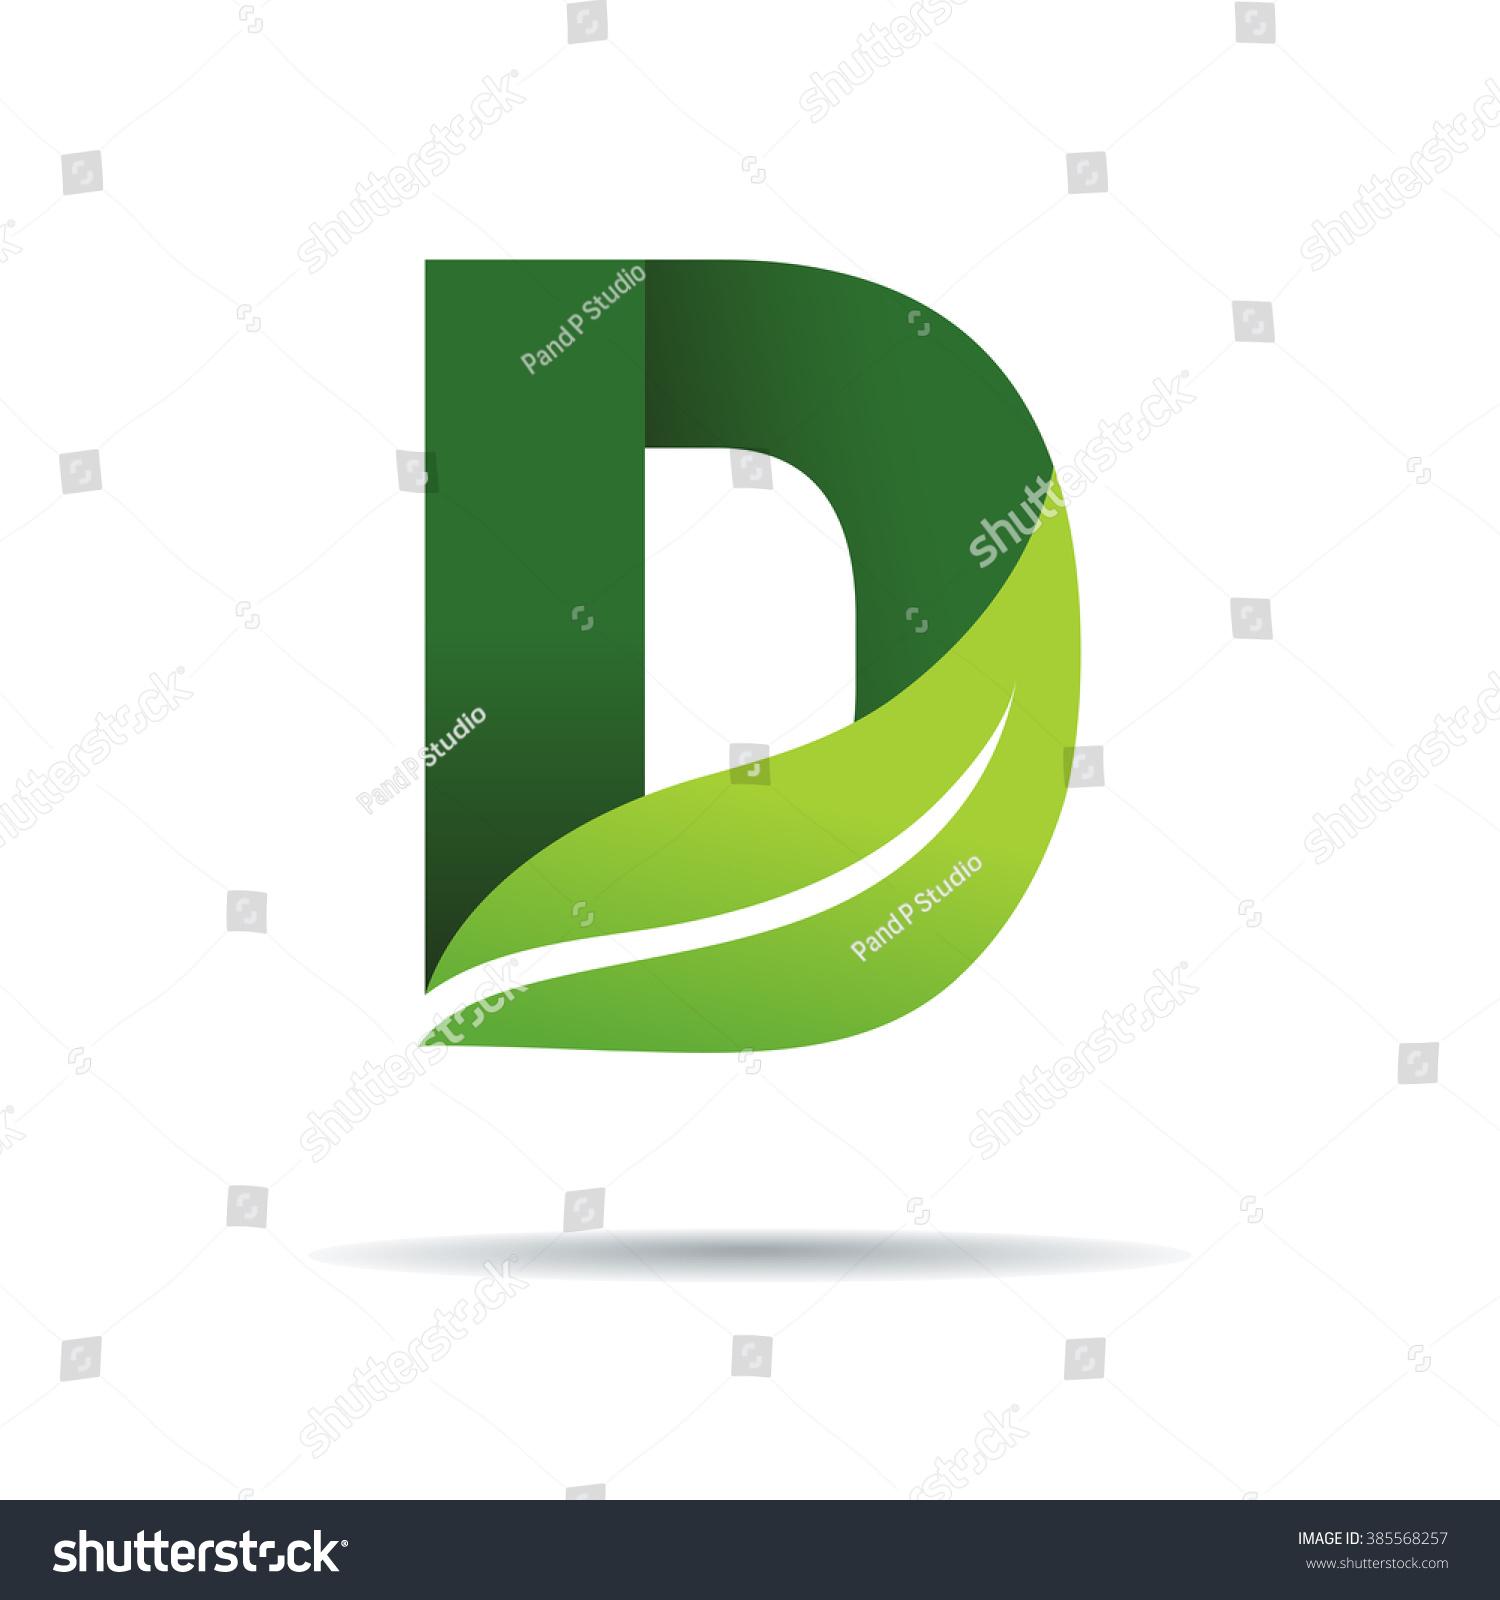 Company Logo Design  making a company logo in Adobe Photoshop